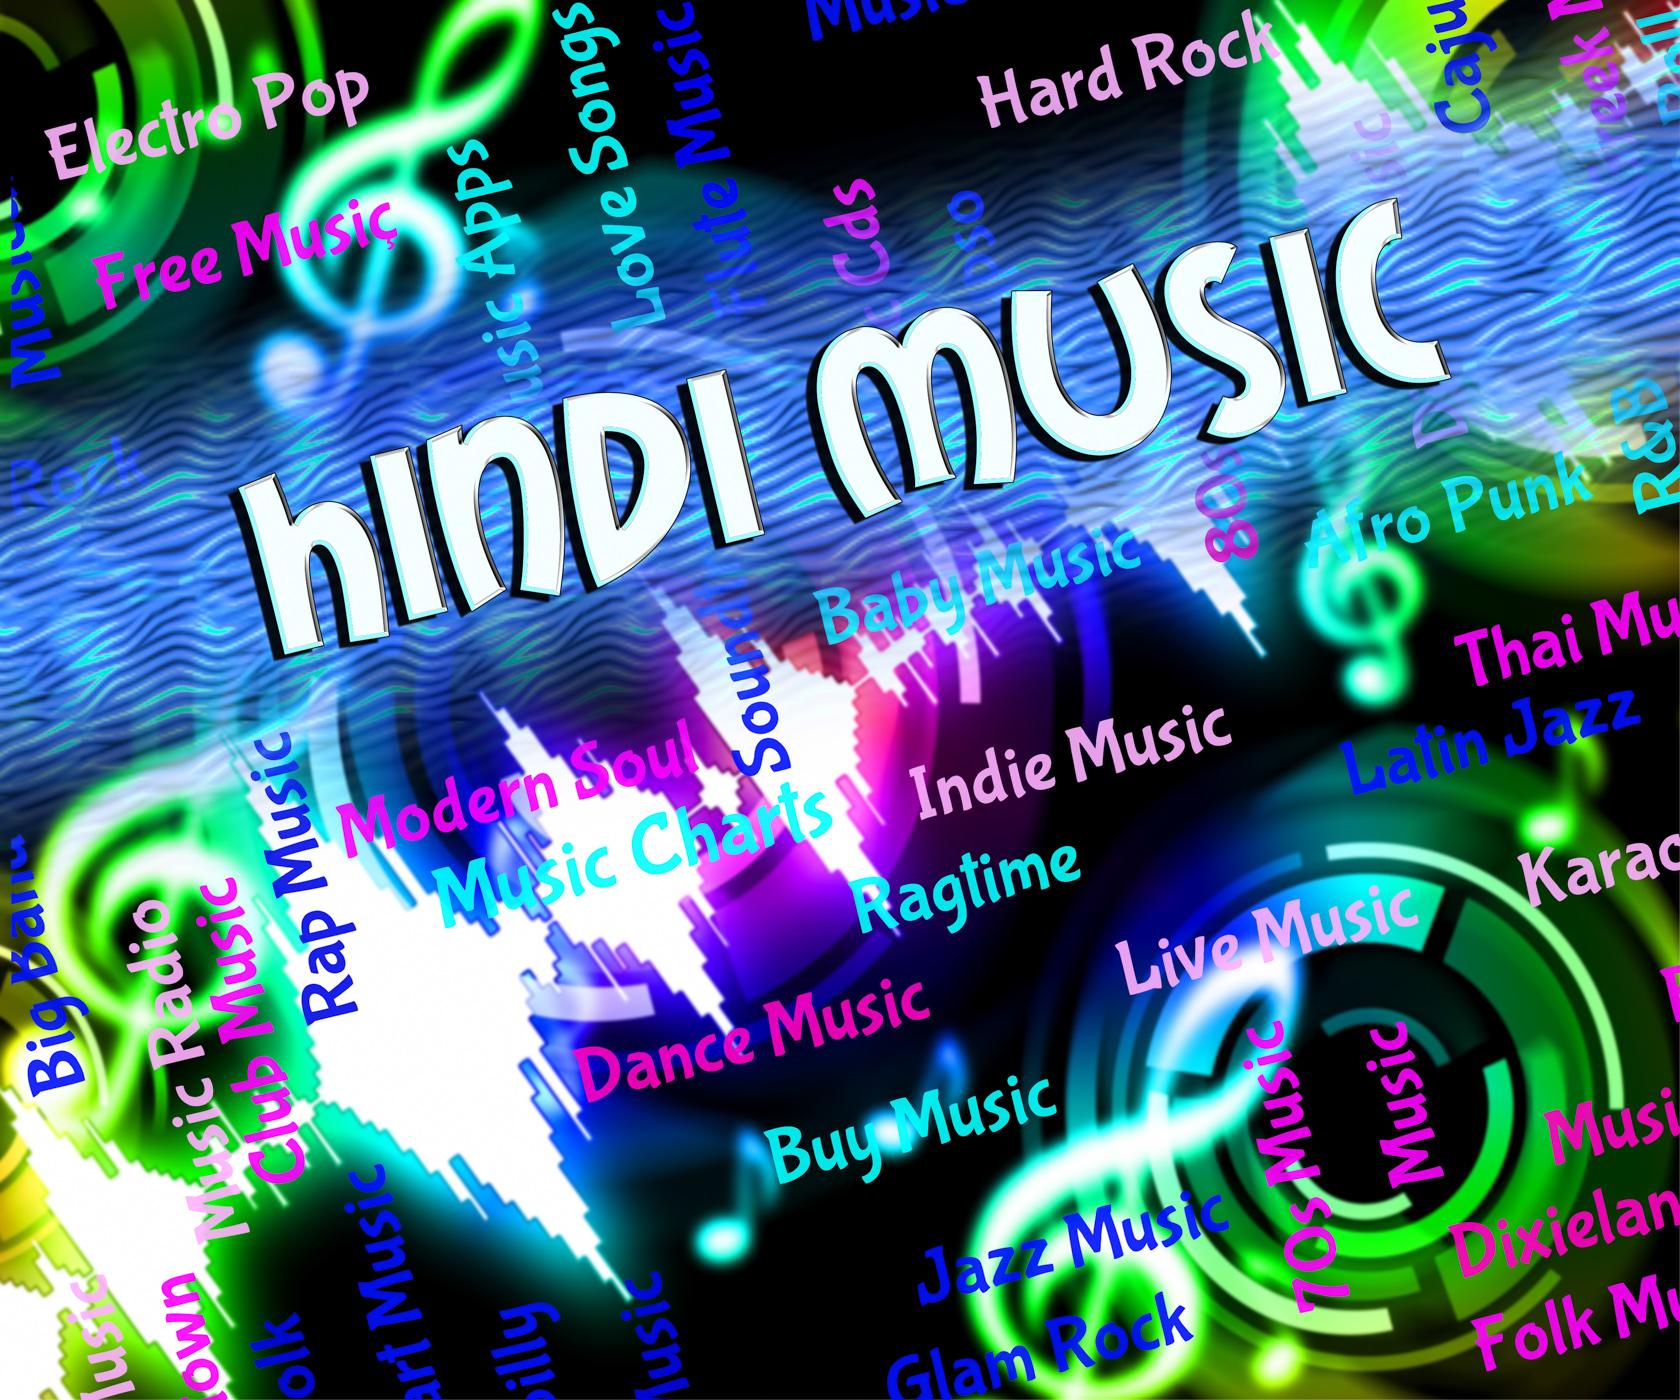 Hindi music represents sound tracks and hindustani photo